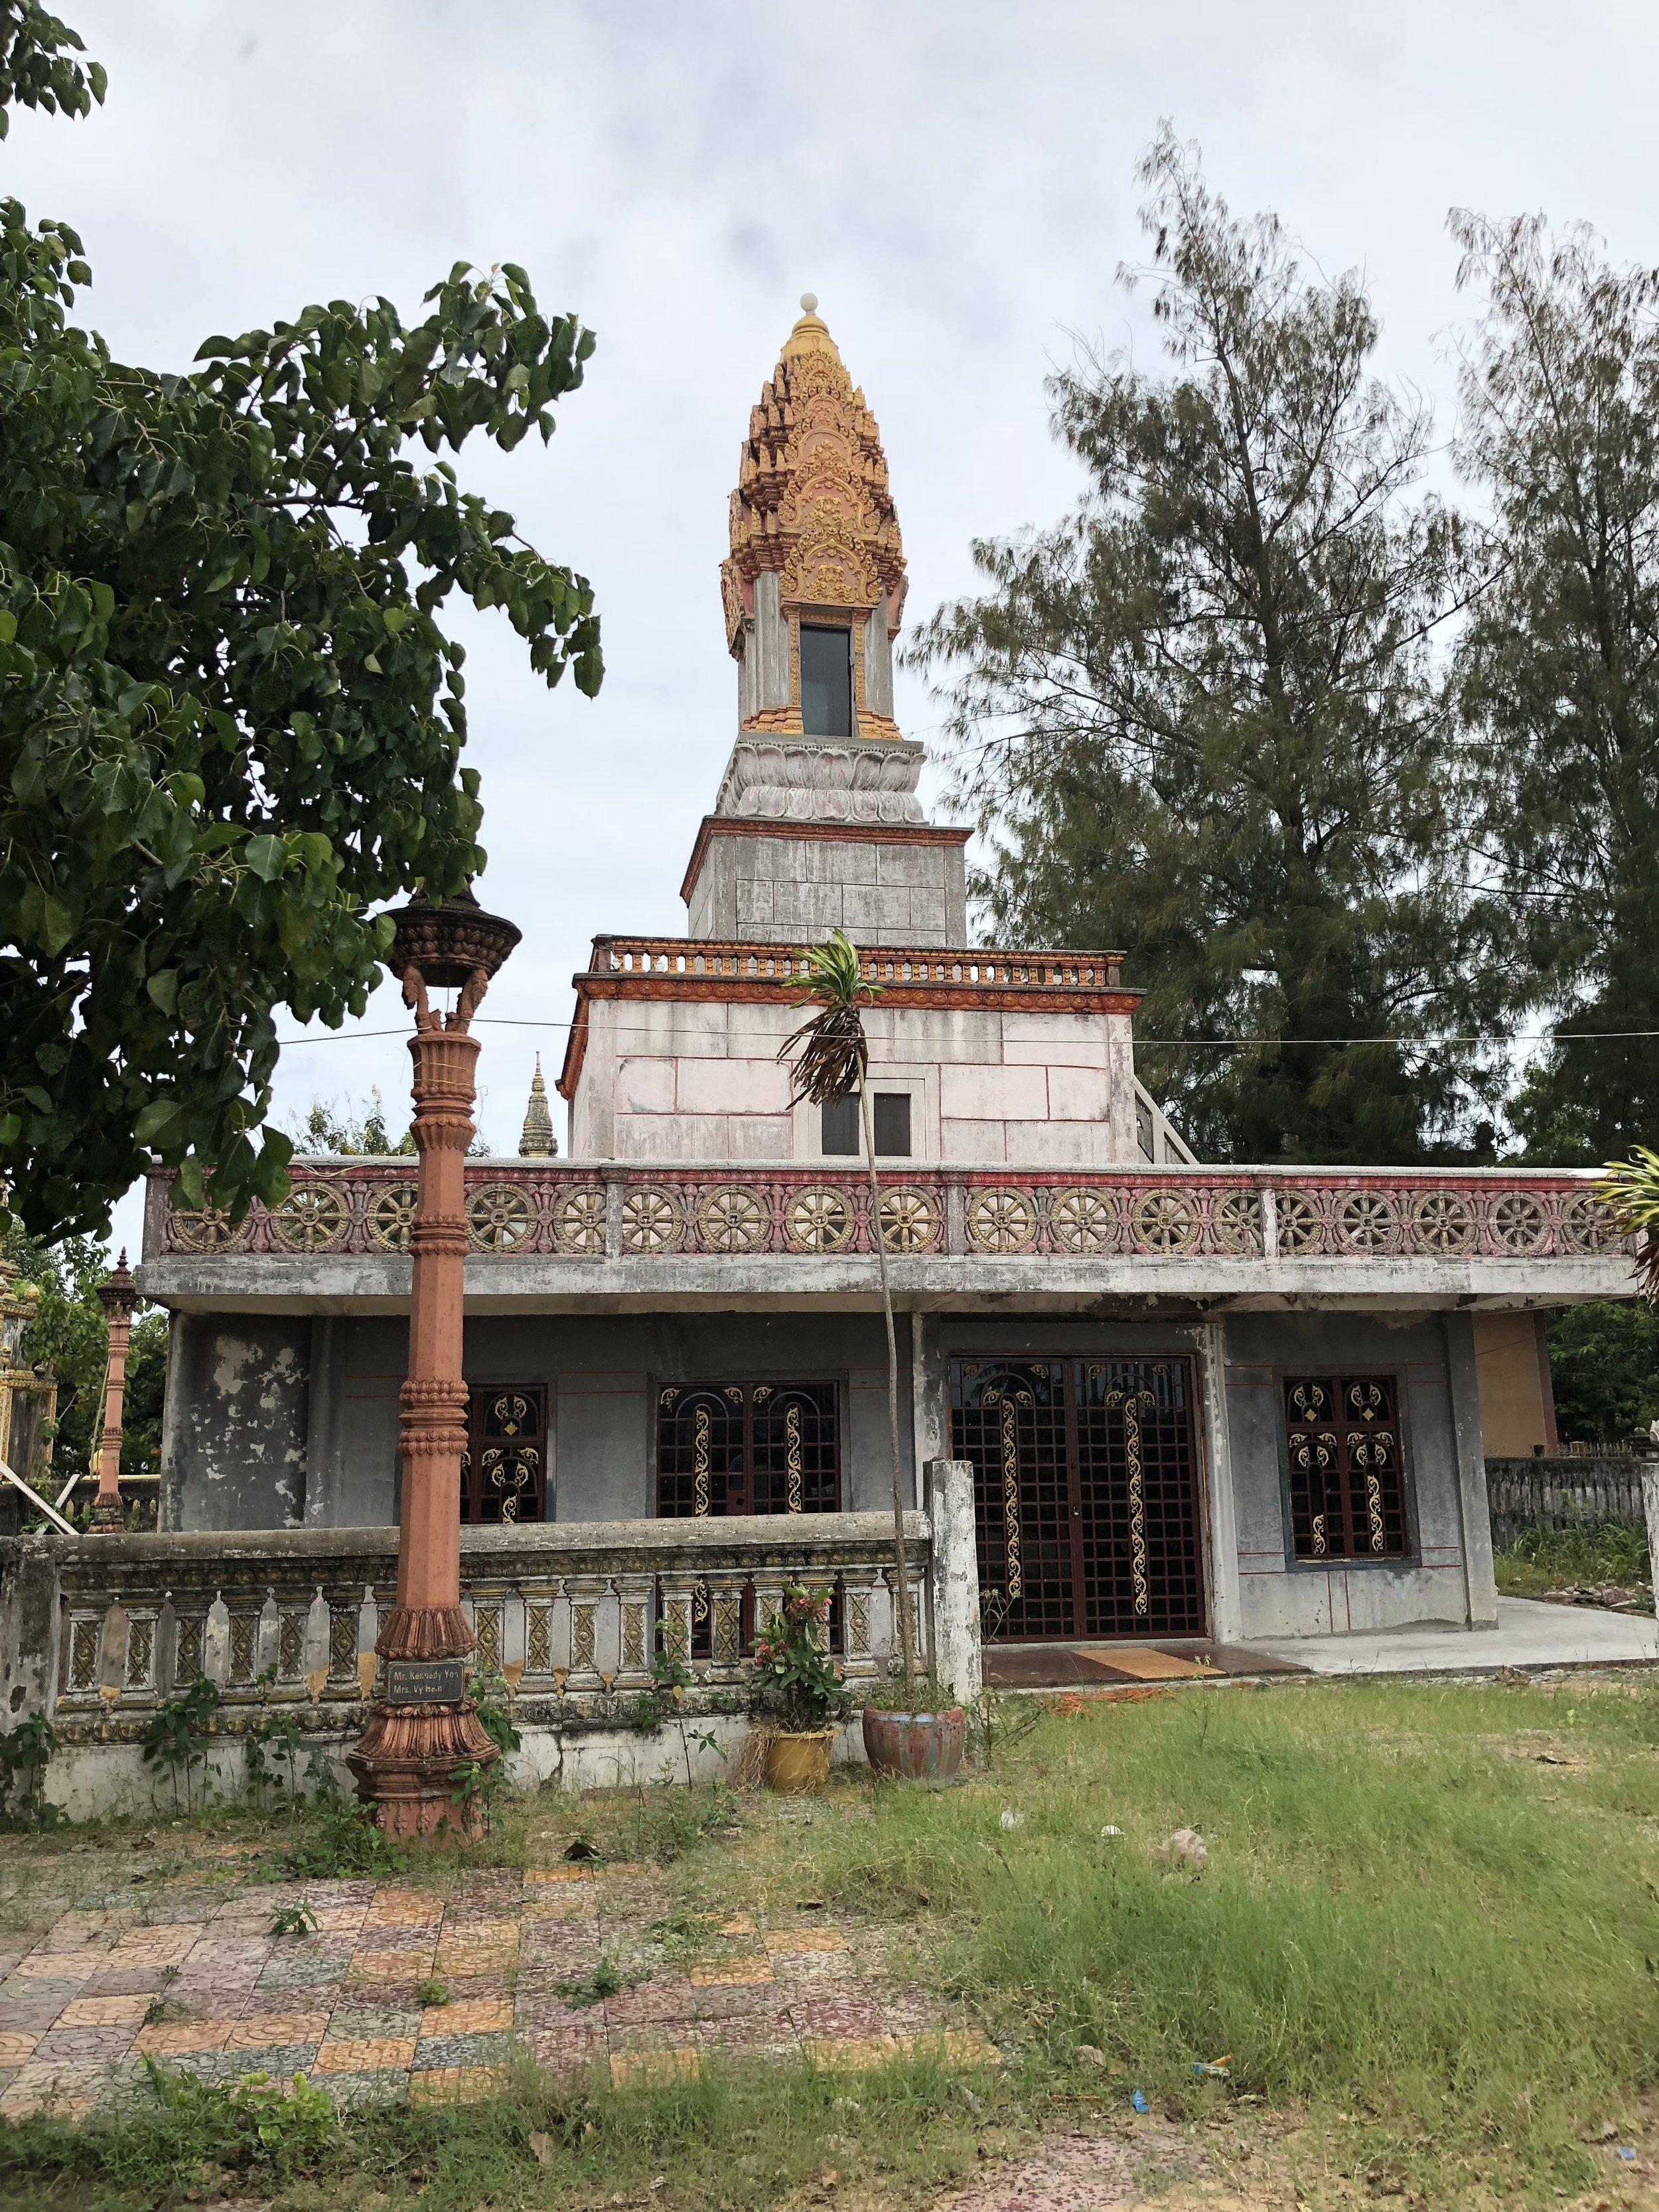 65 phnom penh chedi built by king sihanouk wat nguon pich 2018.jpg